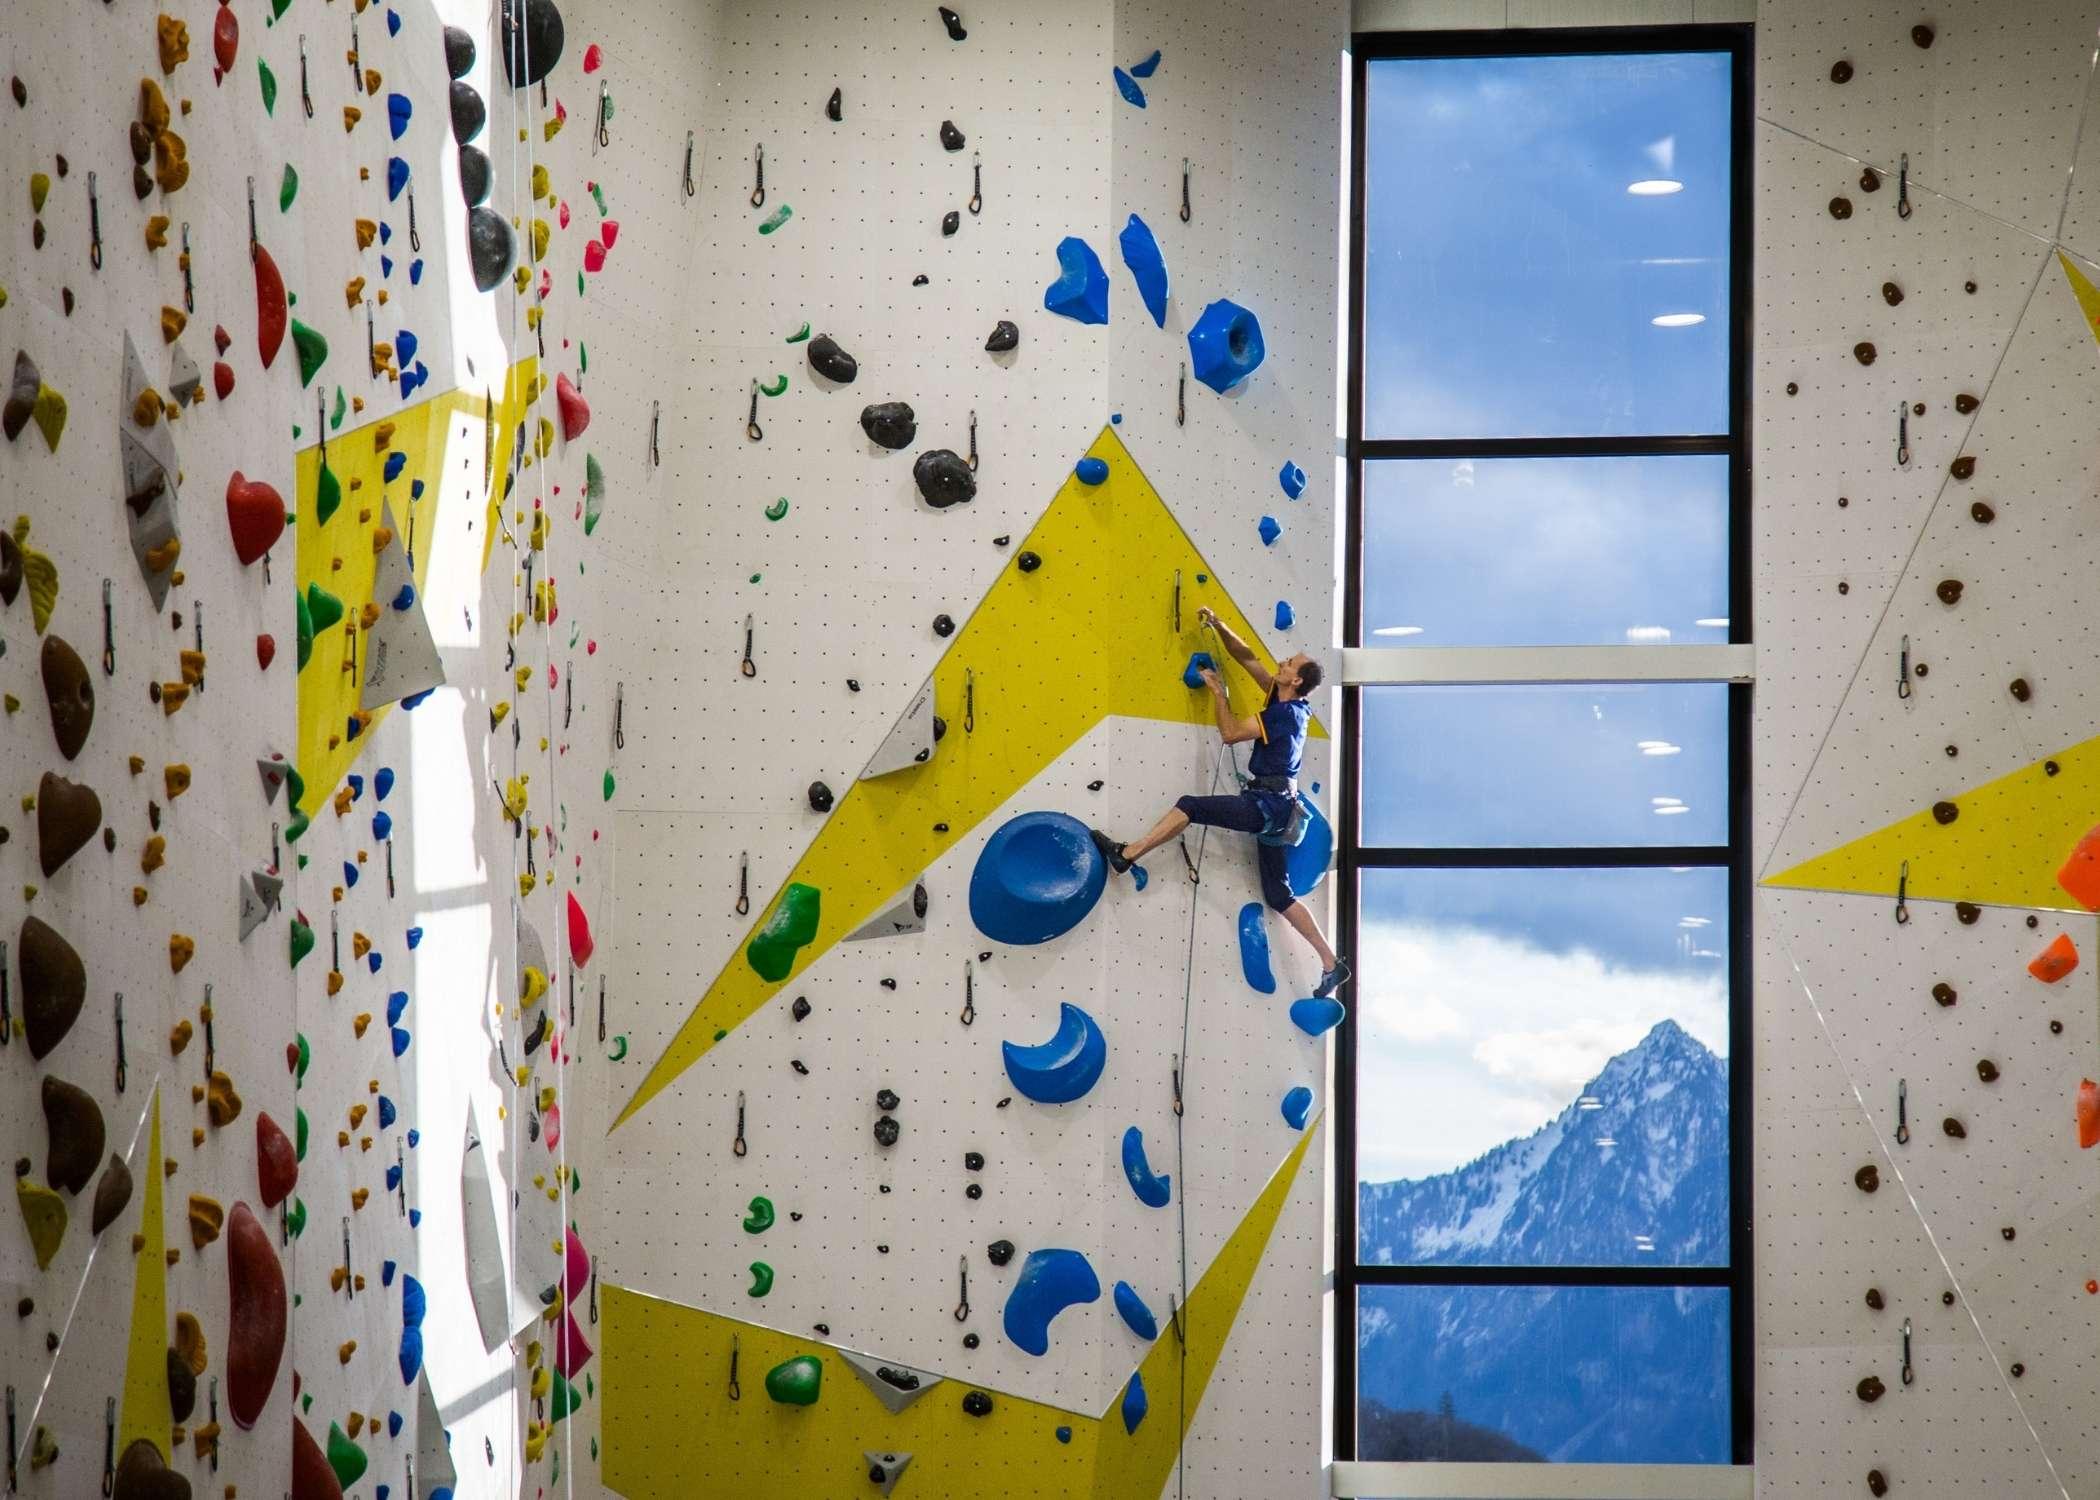 climbing wall installer